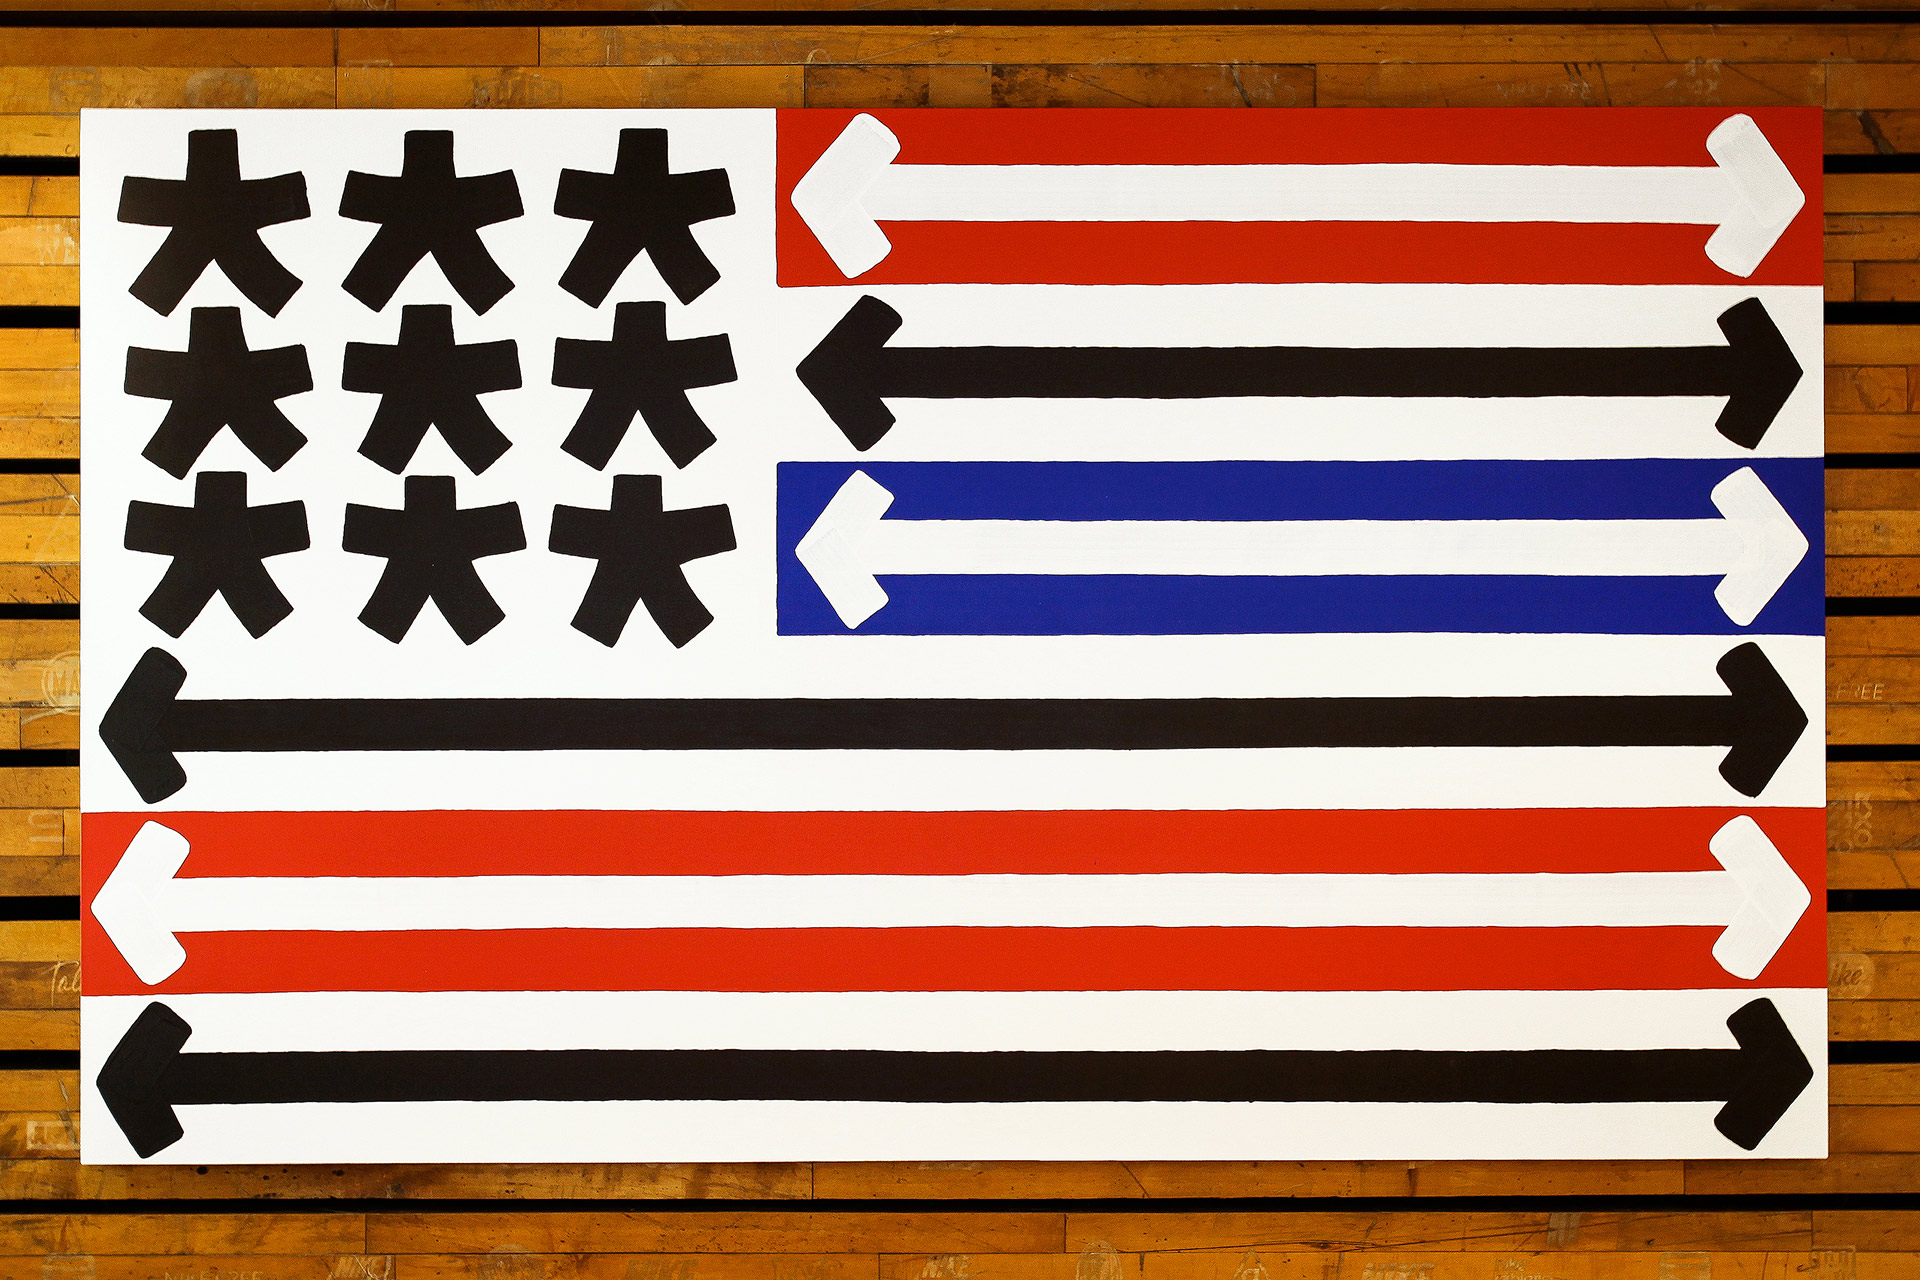 Eric Haze flag 2012 NYC